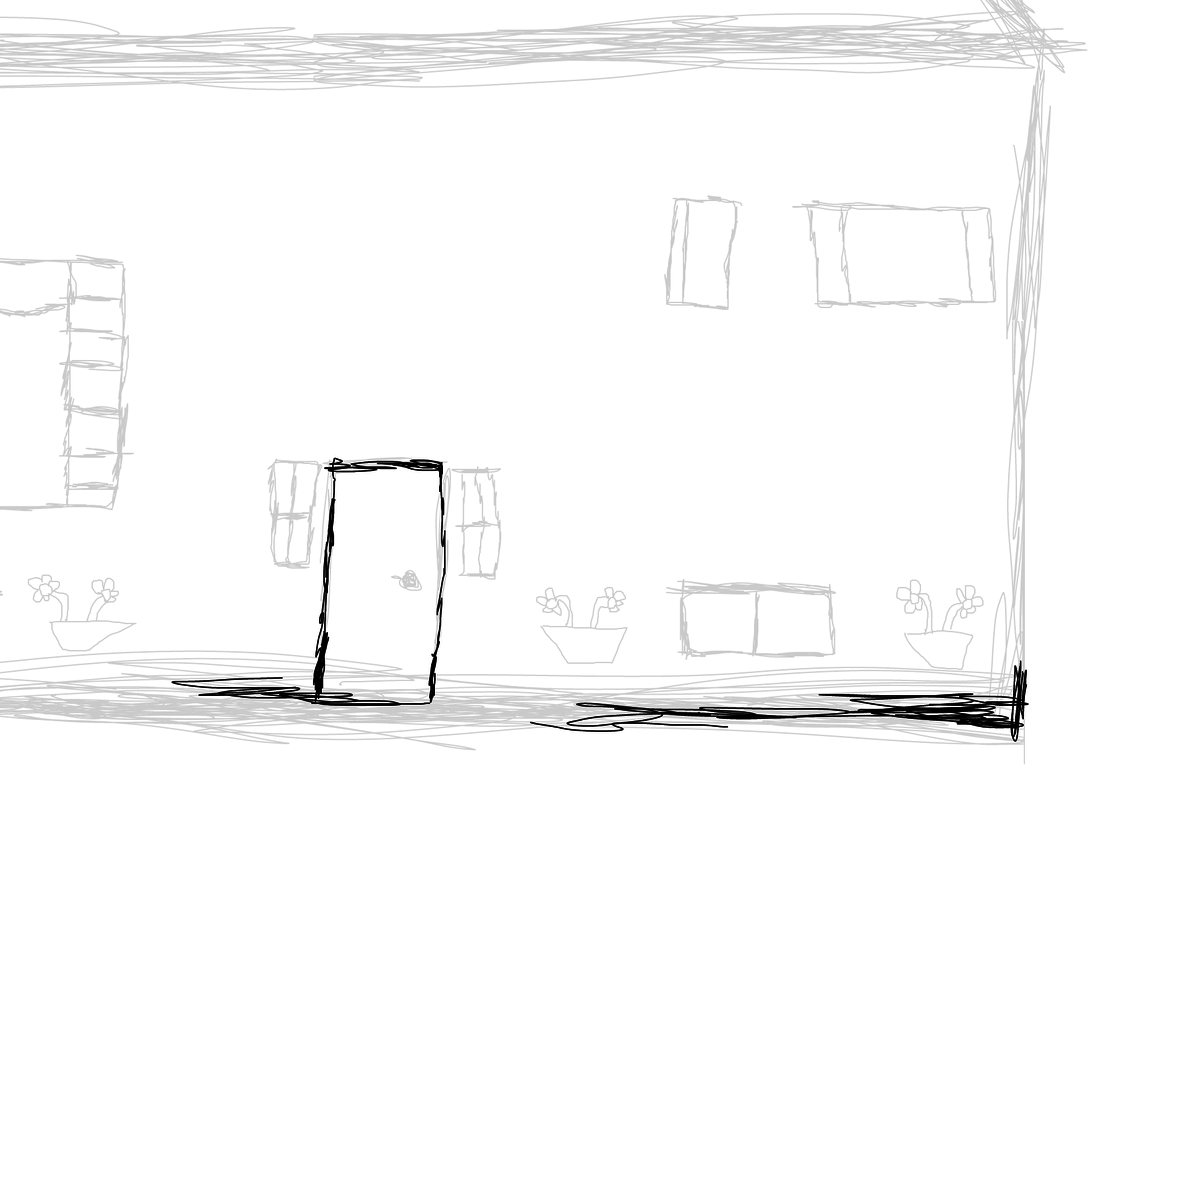 BAAAM drawing#20511 lat:45.0636940002441400lng: -64.4478759765625000